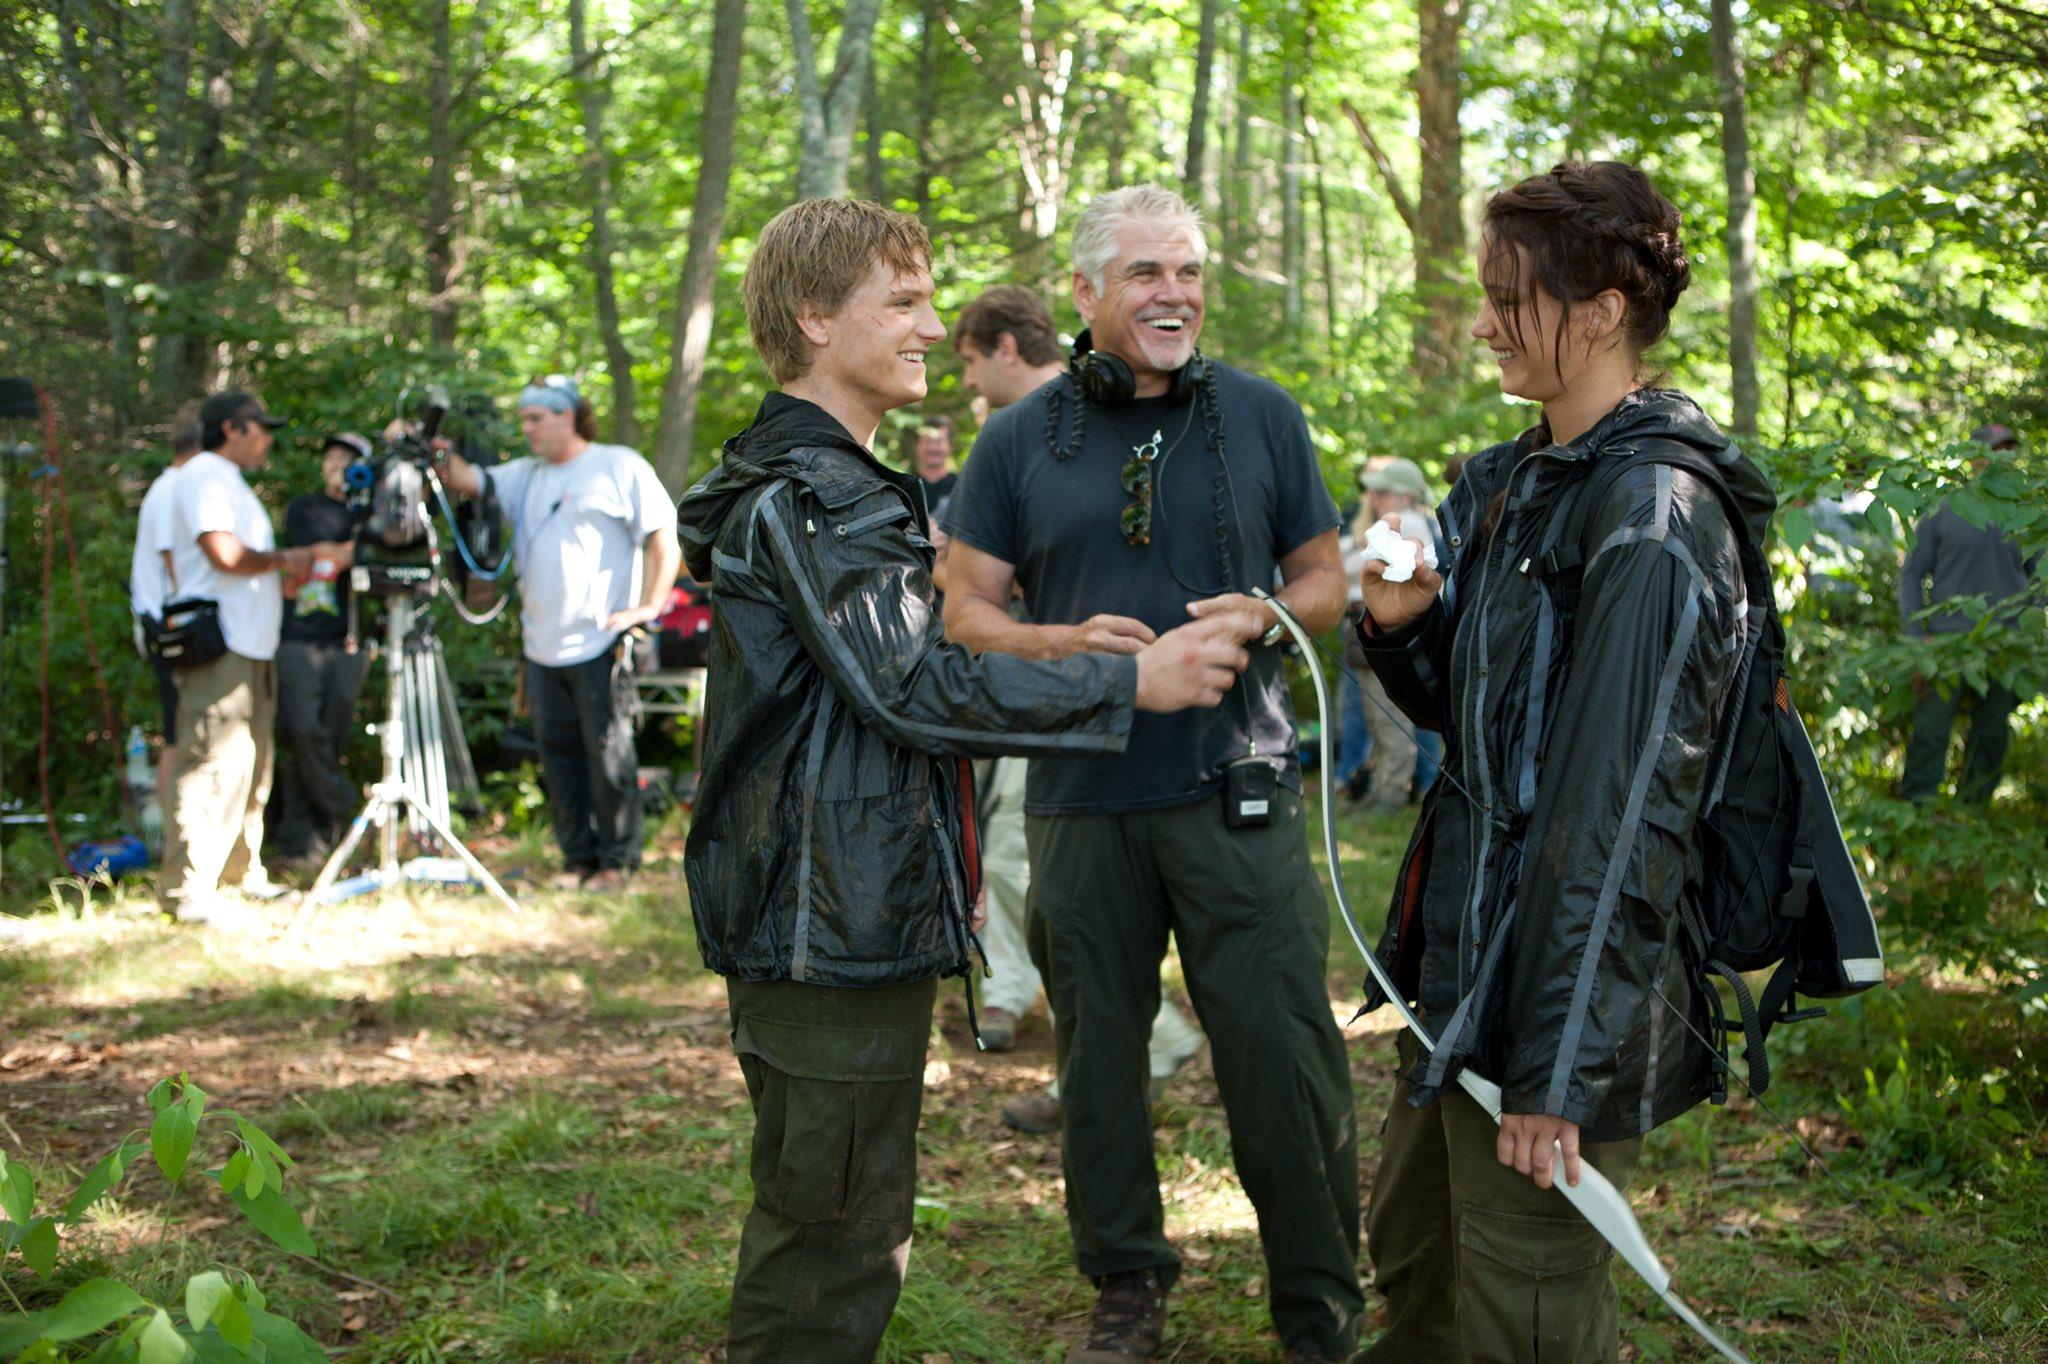 11 nuove foto dal set di Hunger Games